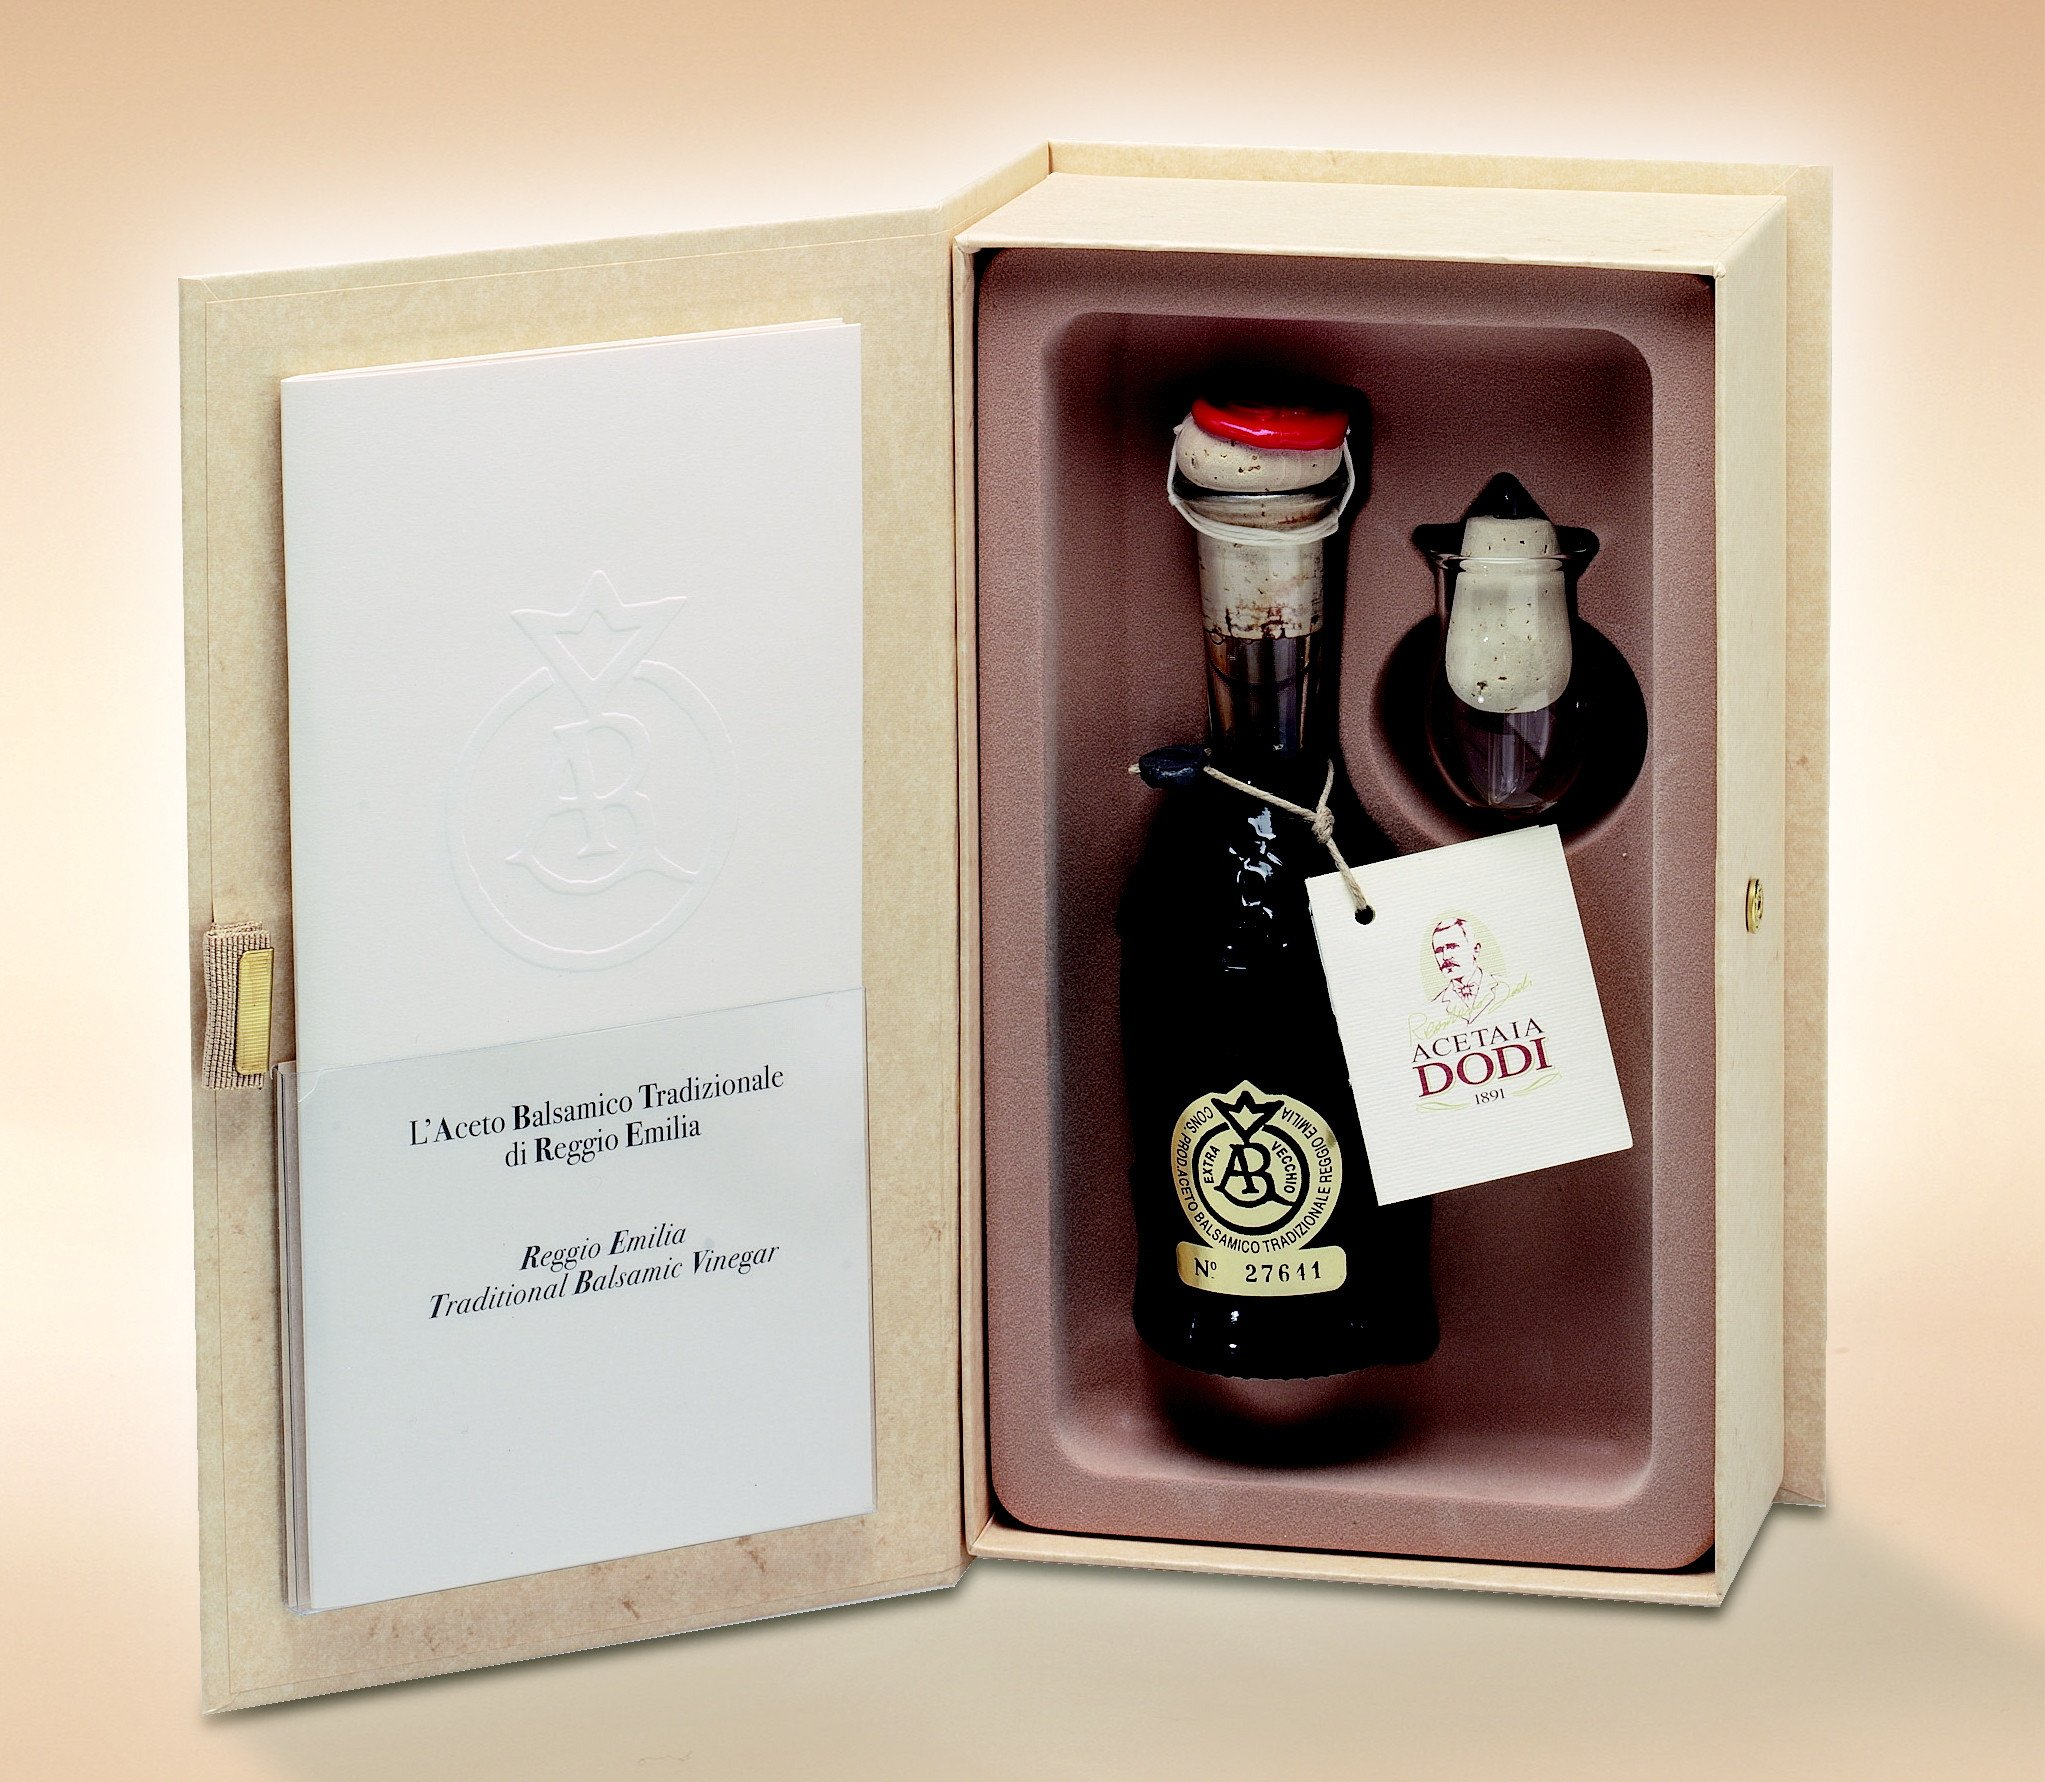 Traditional Balsamic Vinegar, Reggio Emilia, Gold Label, Aged minimum of 25 years, 100 ml